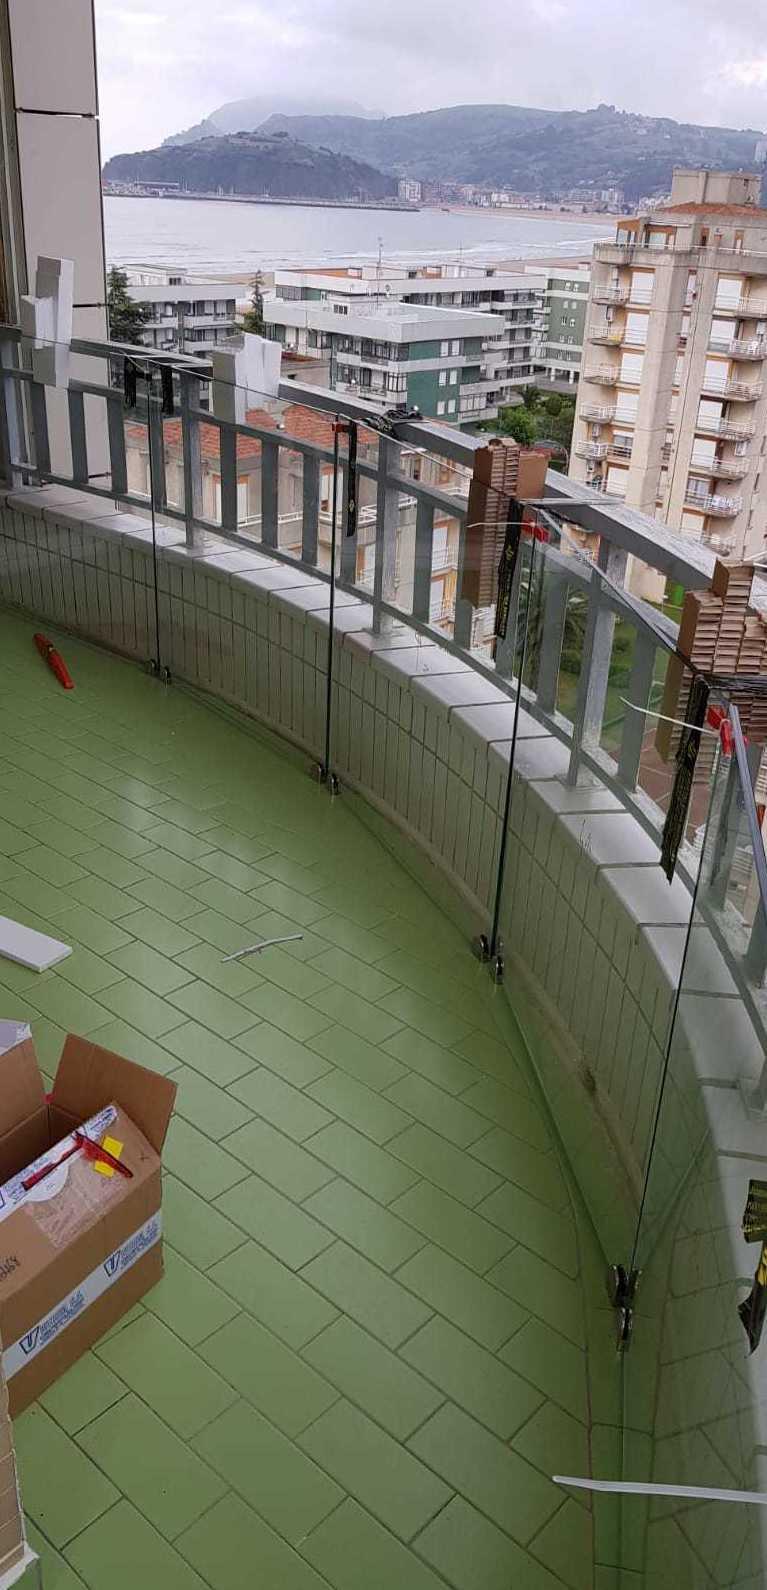 Cerramiento de terrazas en Cantábria.